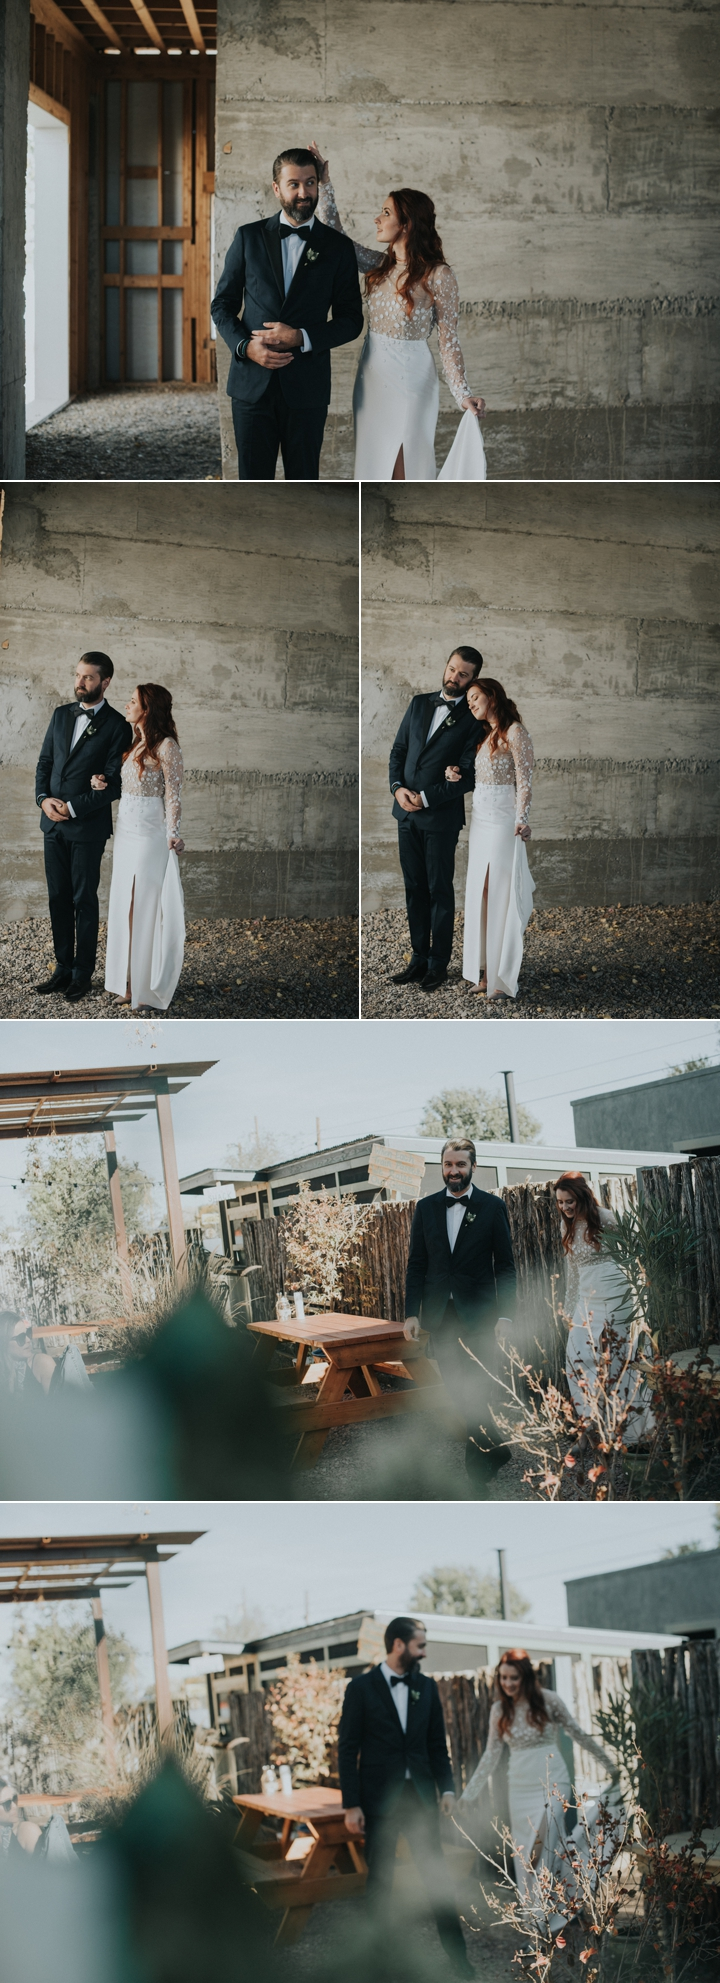 marfa-texas-weddings-photographers 25.jpg